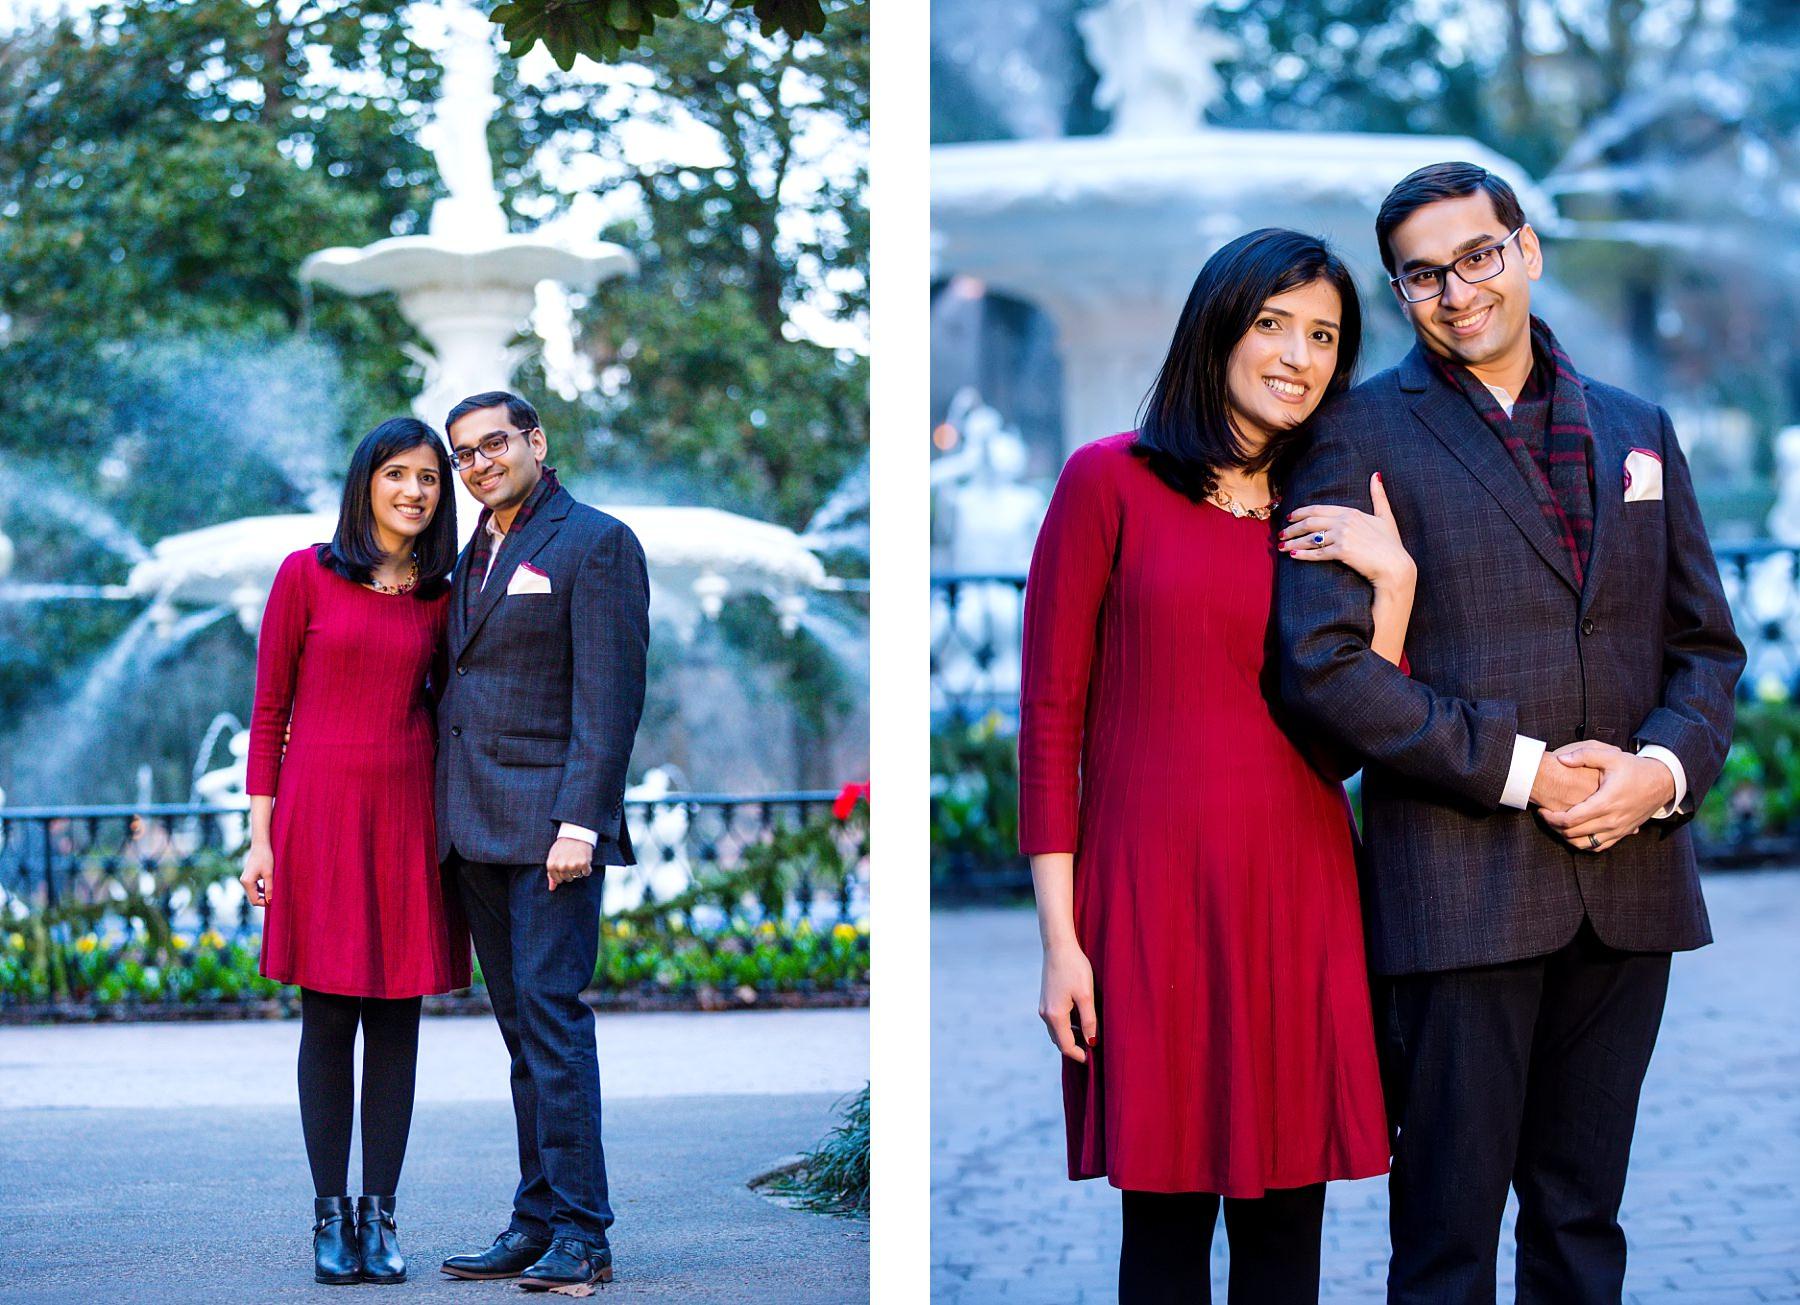 Forsyth Park Savannah Georgia Engagement Session